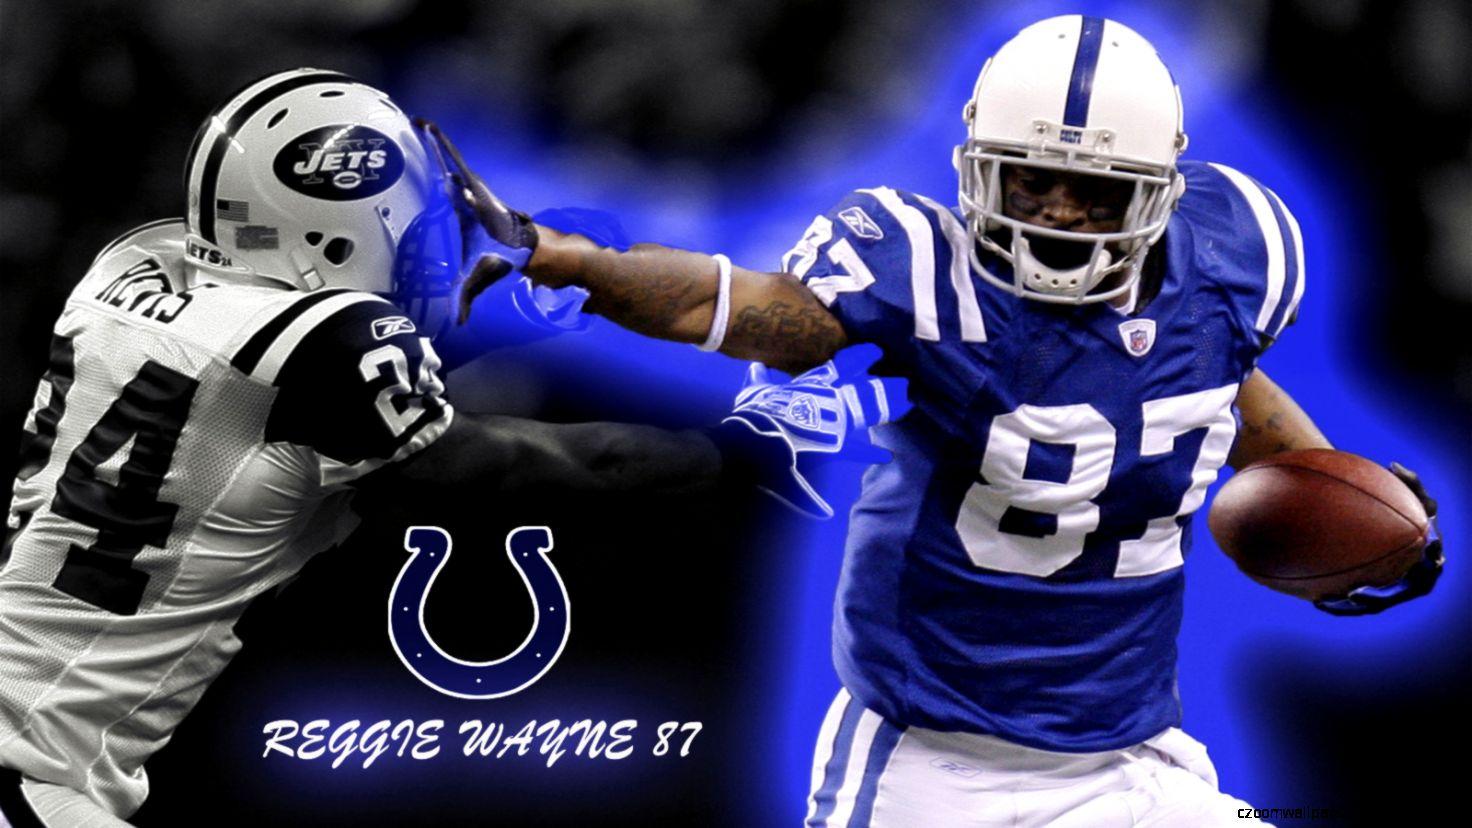 Wallpapers Nhl Nfl Reggie Wayne Indianapolis Colts No 1600x900